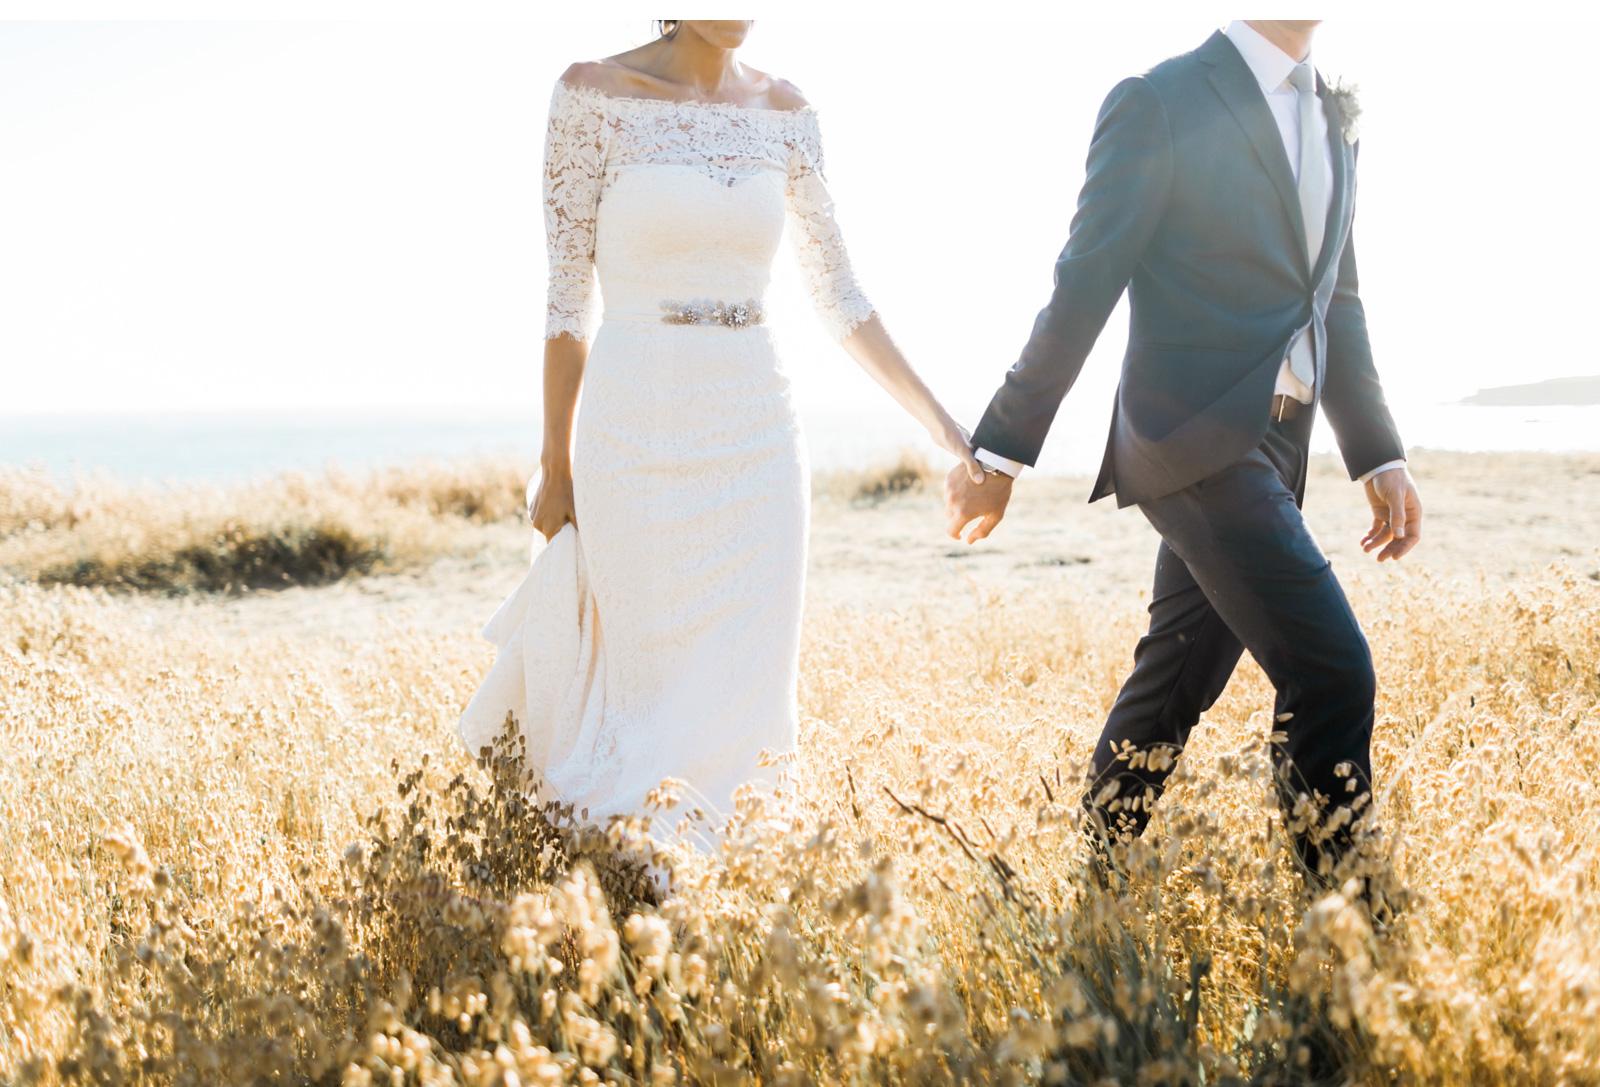 Style-Me-Pretty-Mendocino-Wedding-Natalie-Schutt-Photography_17.jpg